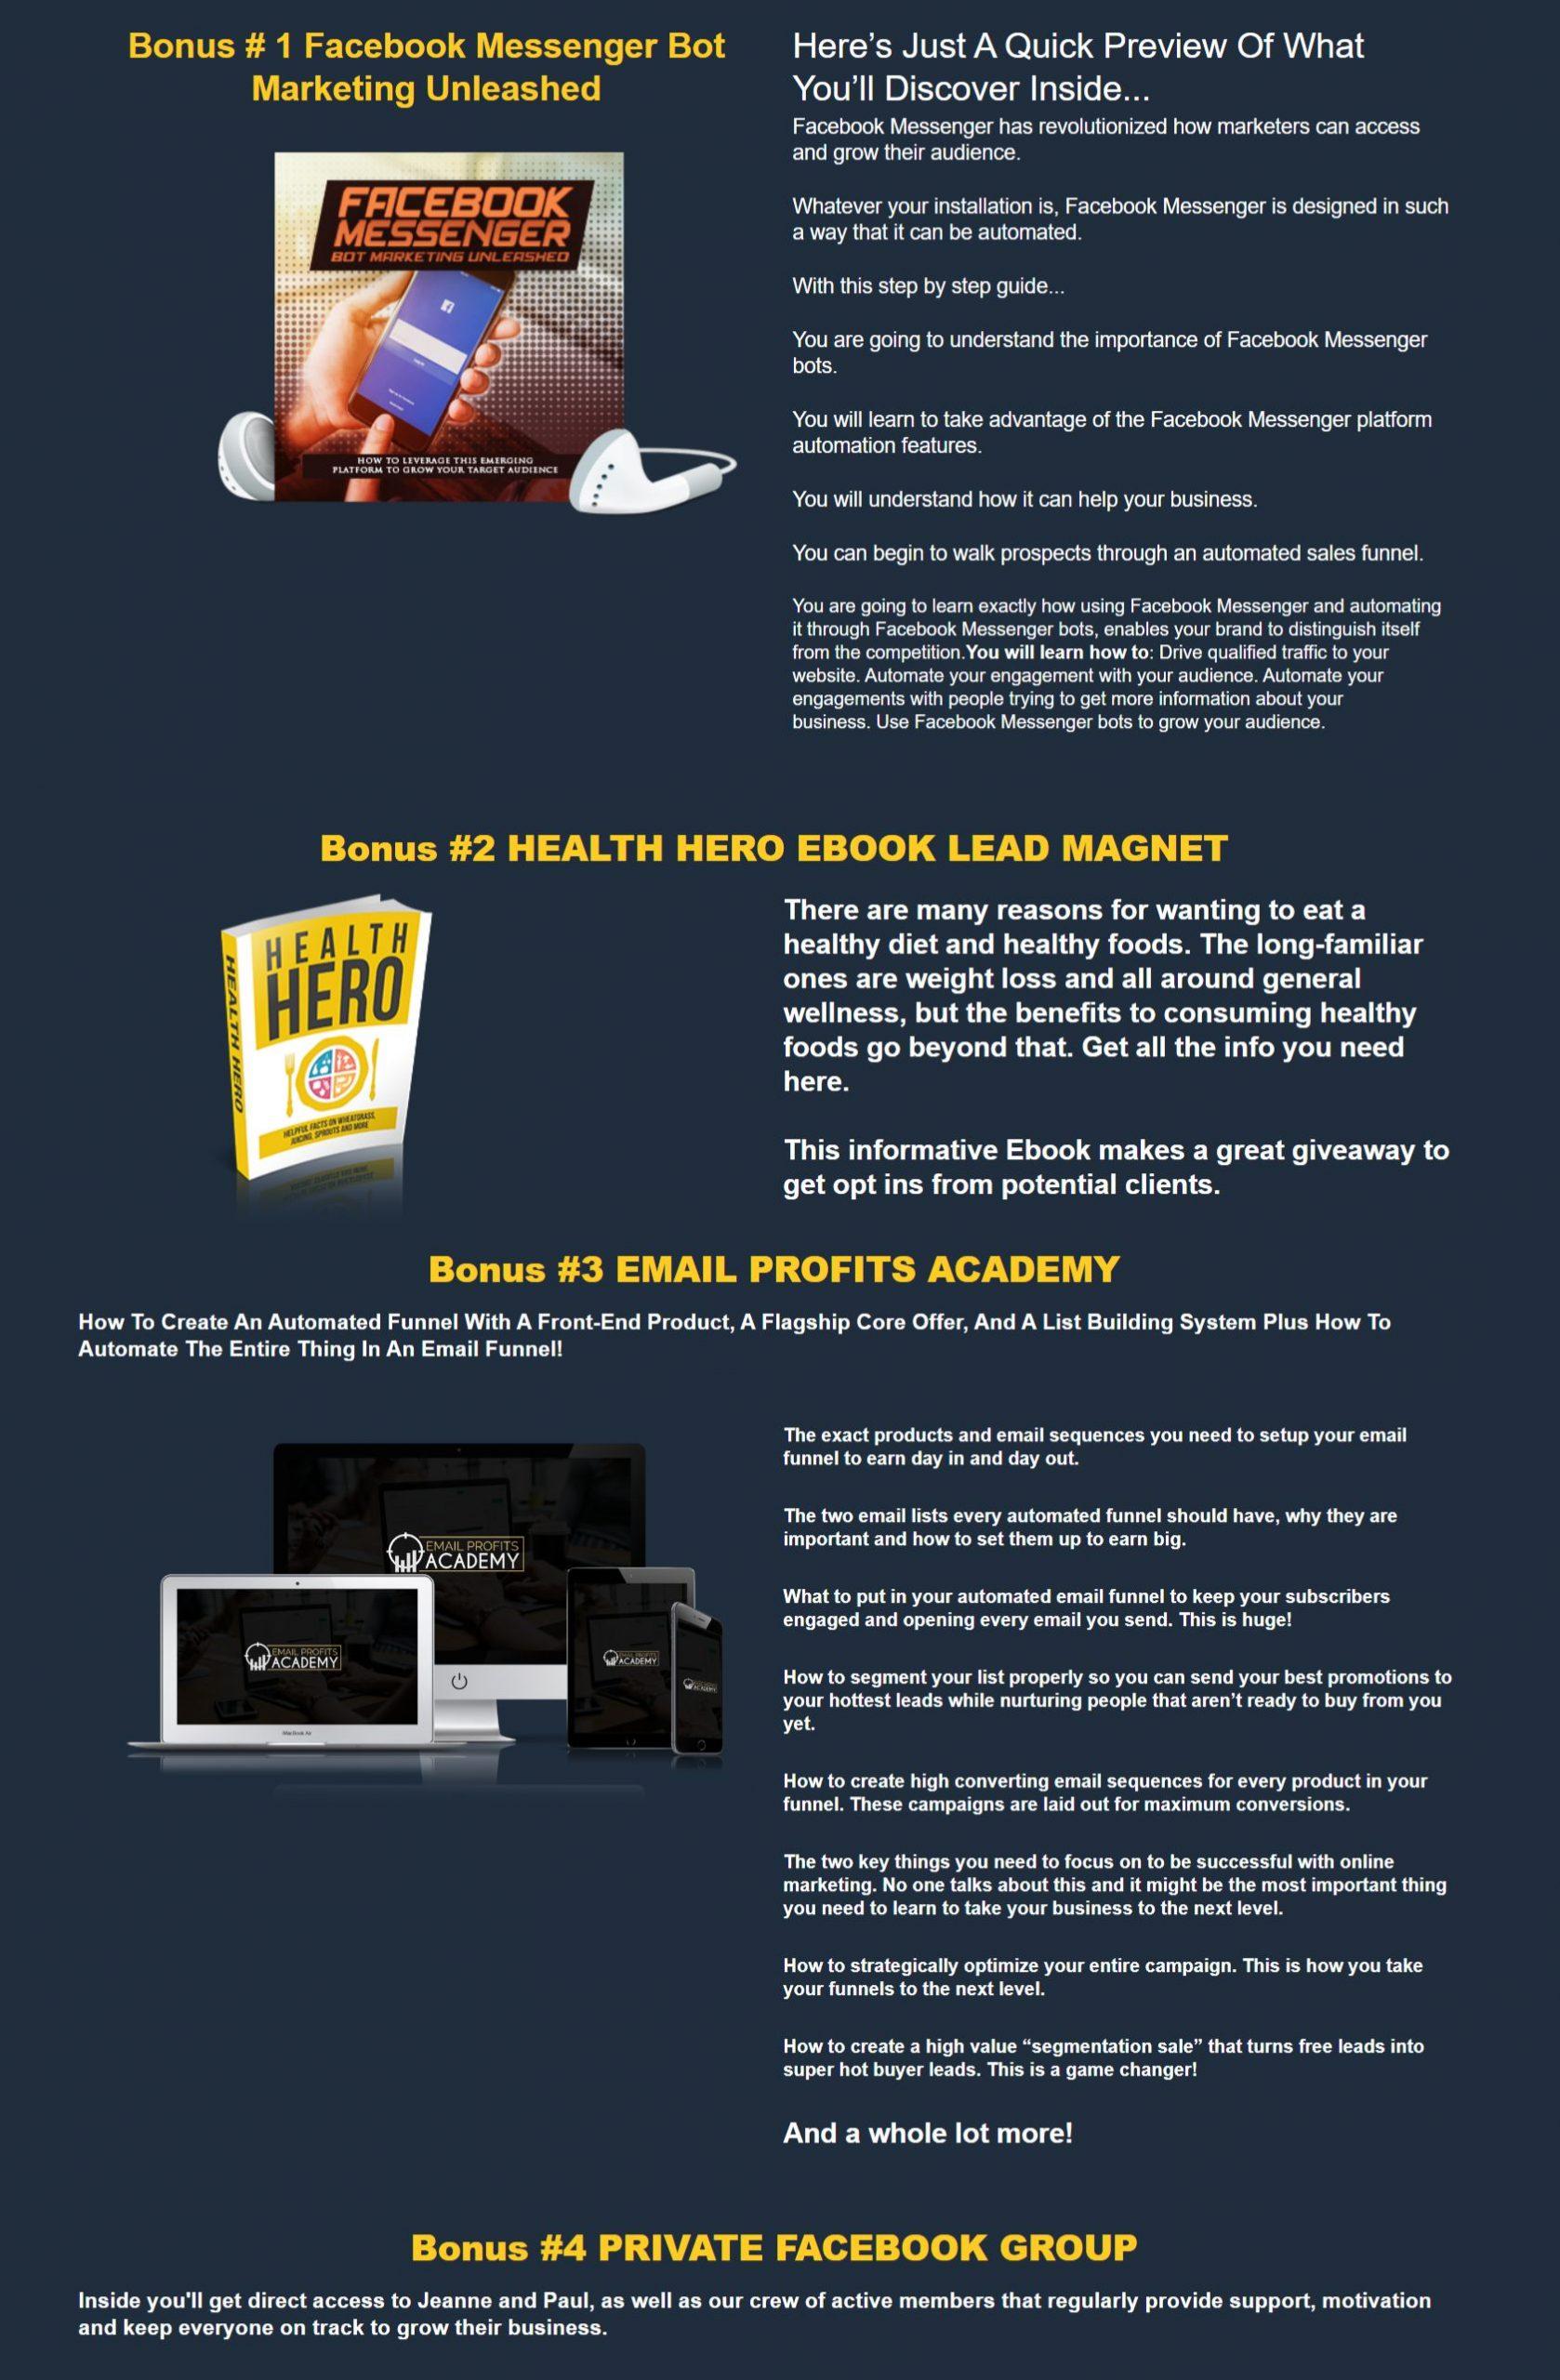 Social-Entrepreneur-365-Healthy-Living-Edition-Bonuses